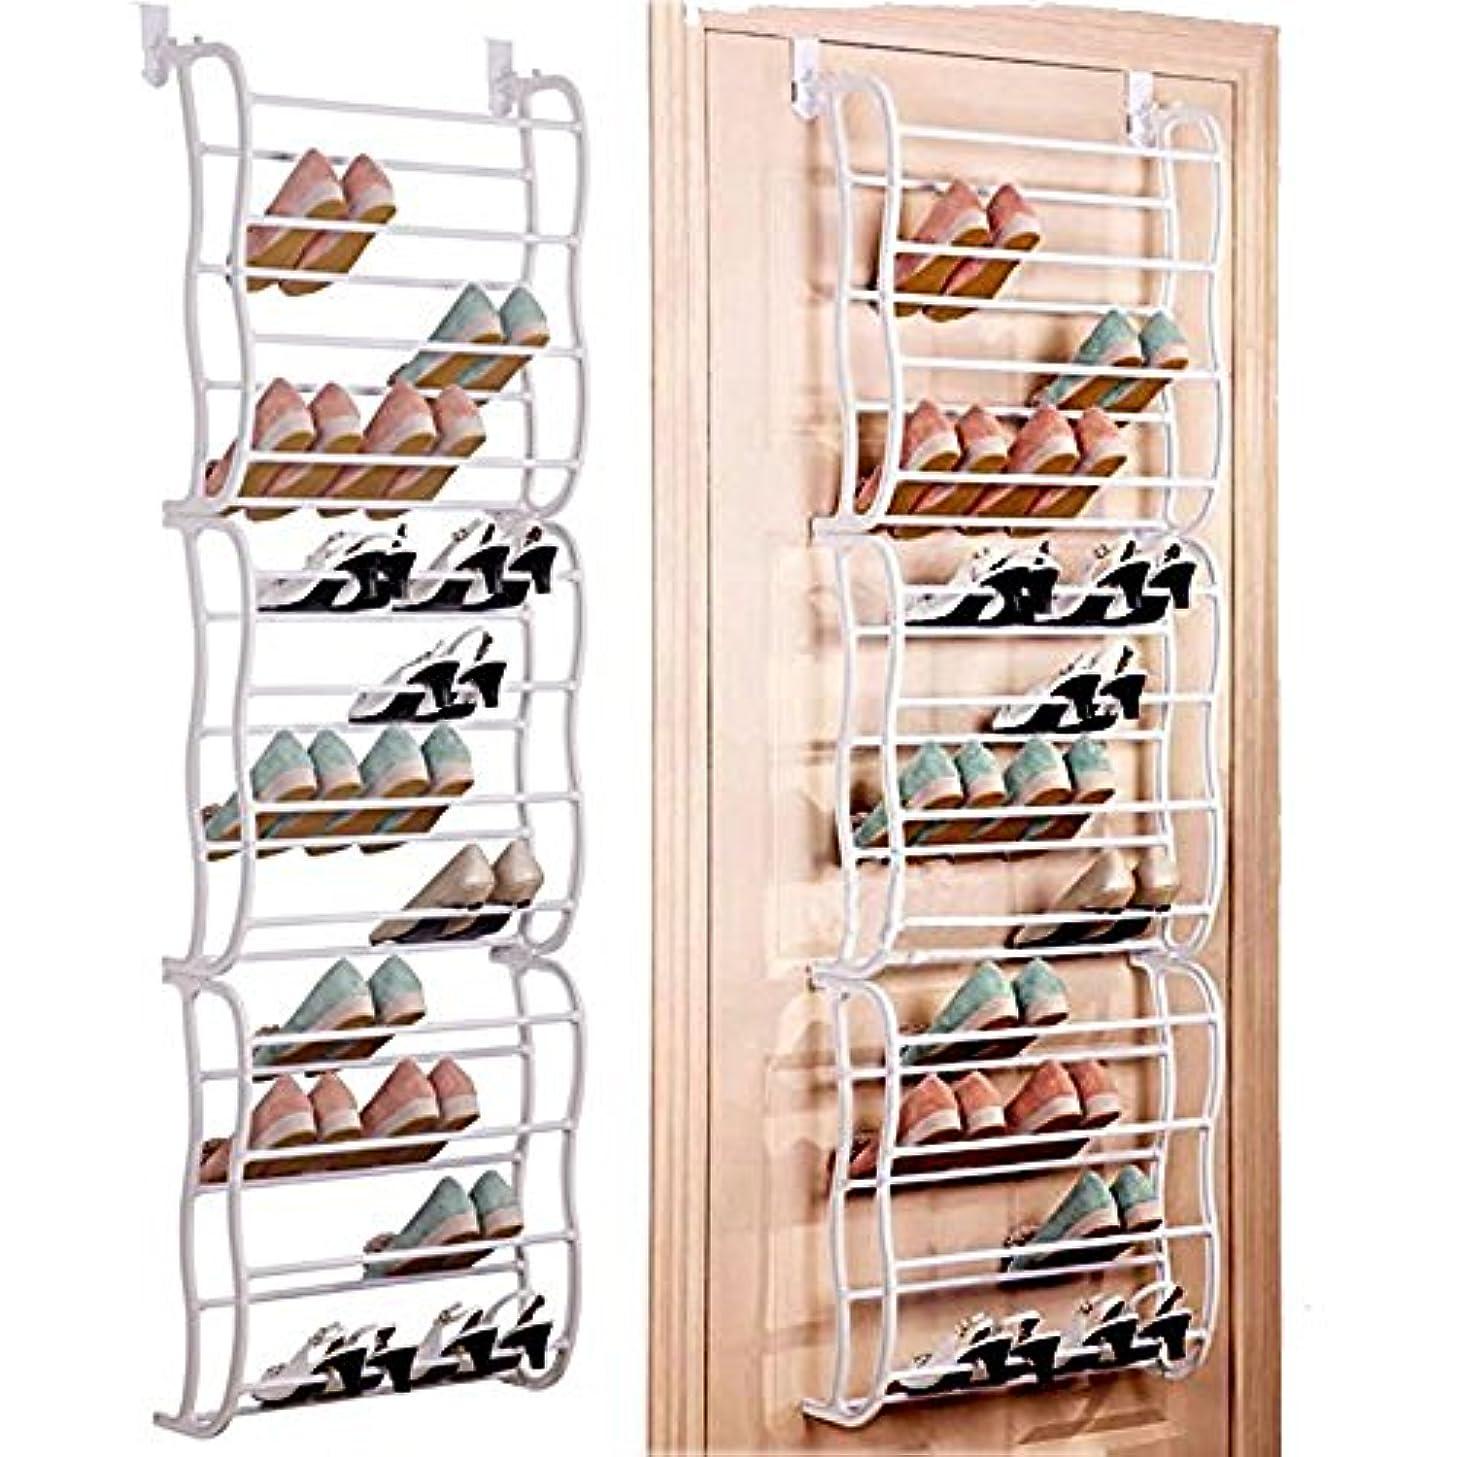 Multifunctional 12 Layers Shoe Rack Hanging Over the Door Home DIY Shoe Organizer Fit 36 Pairs